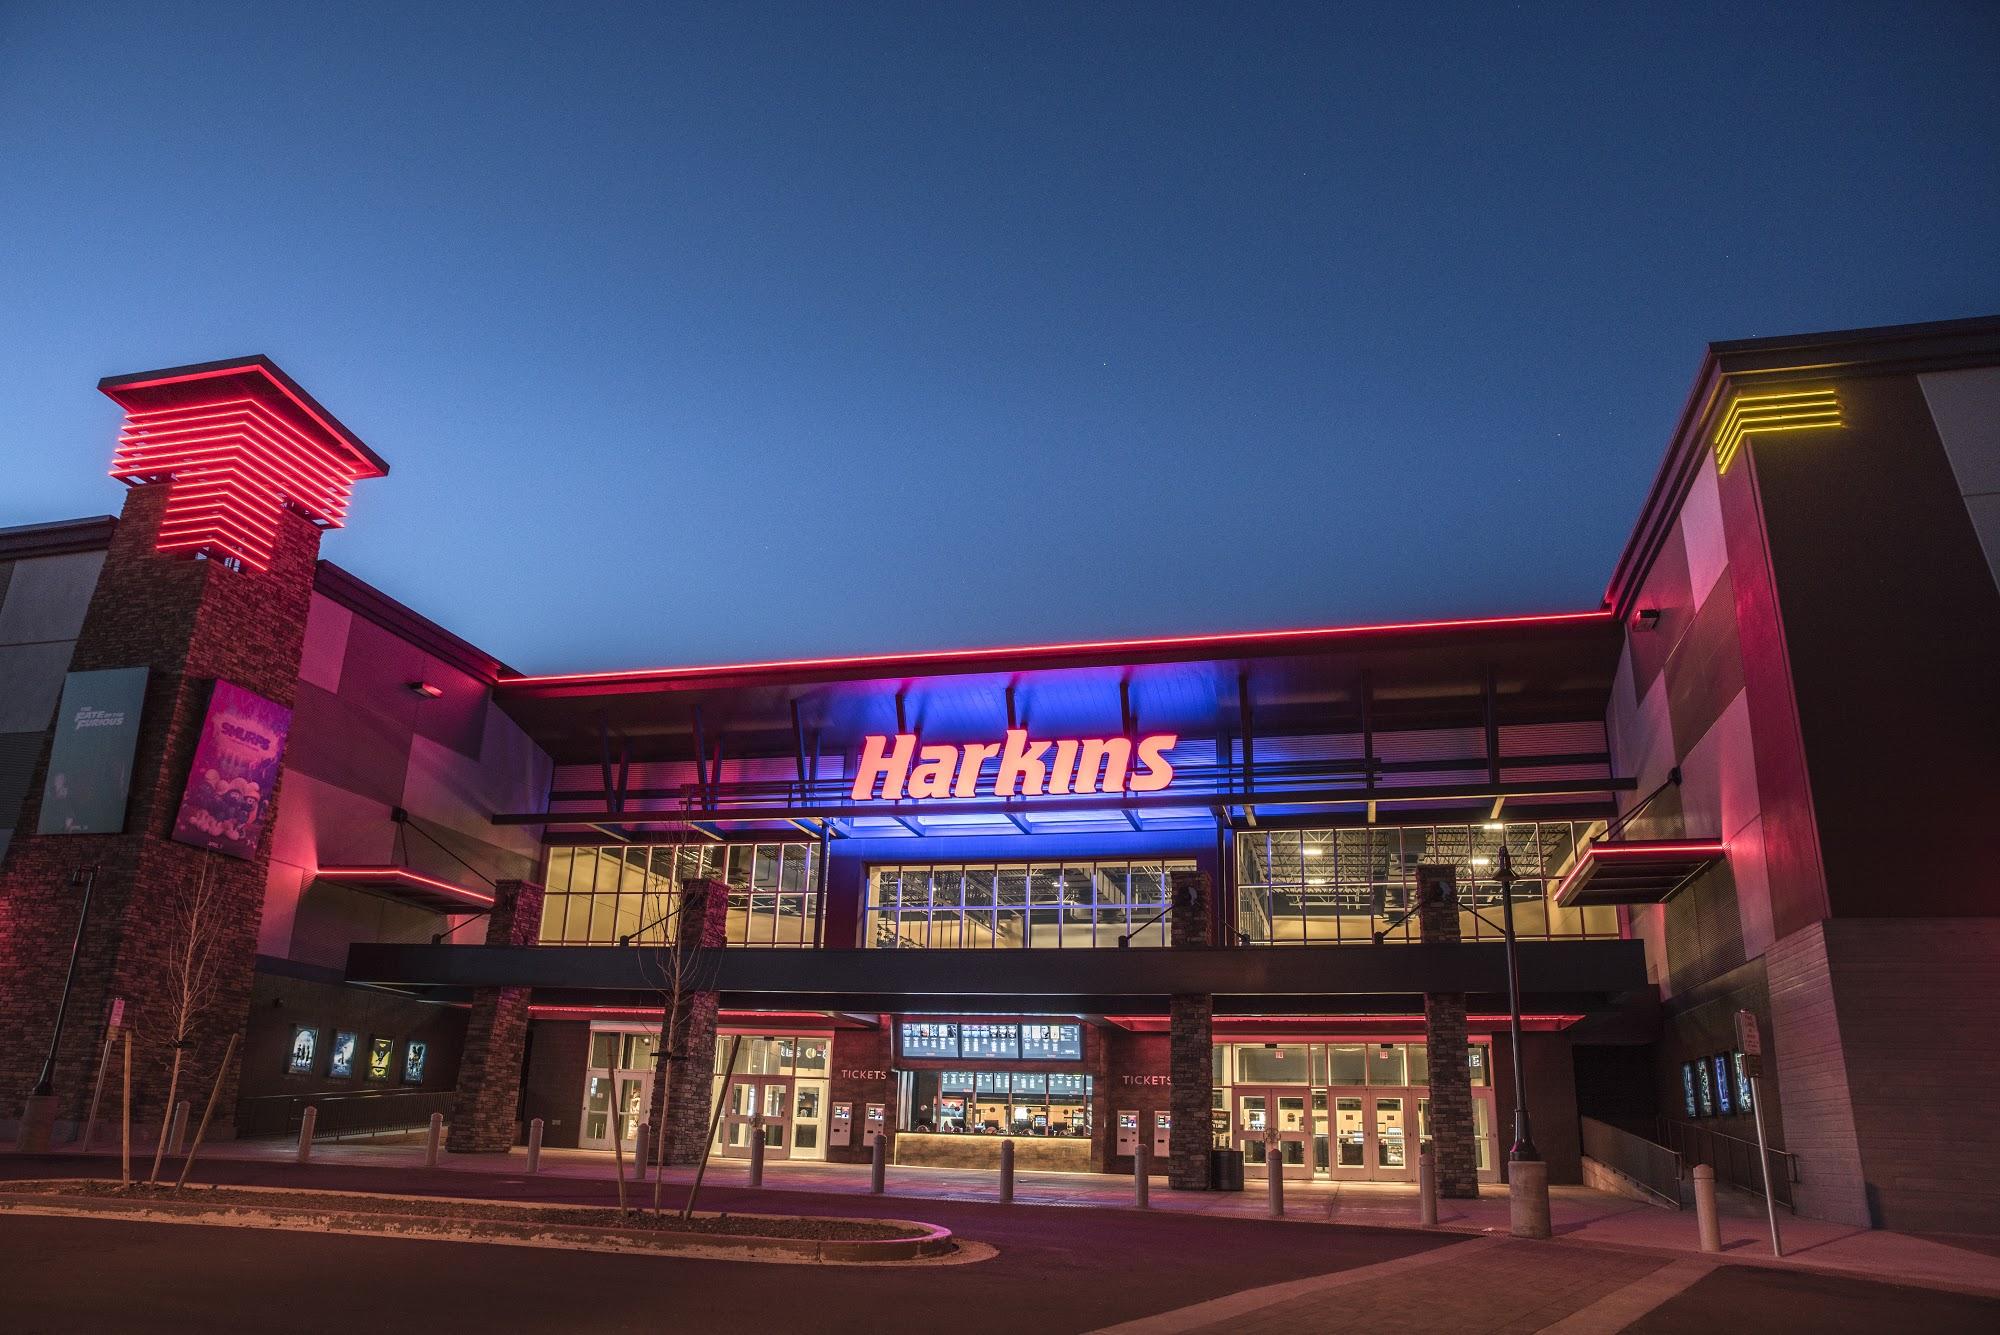 Harkins Theatres Flagstaff 16 4751 E Marketplace Dr, Flagstaff